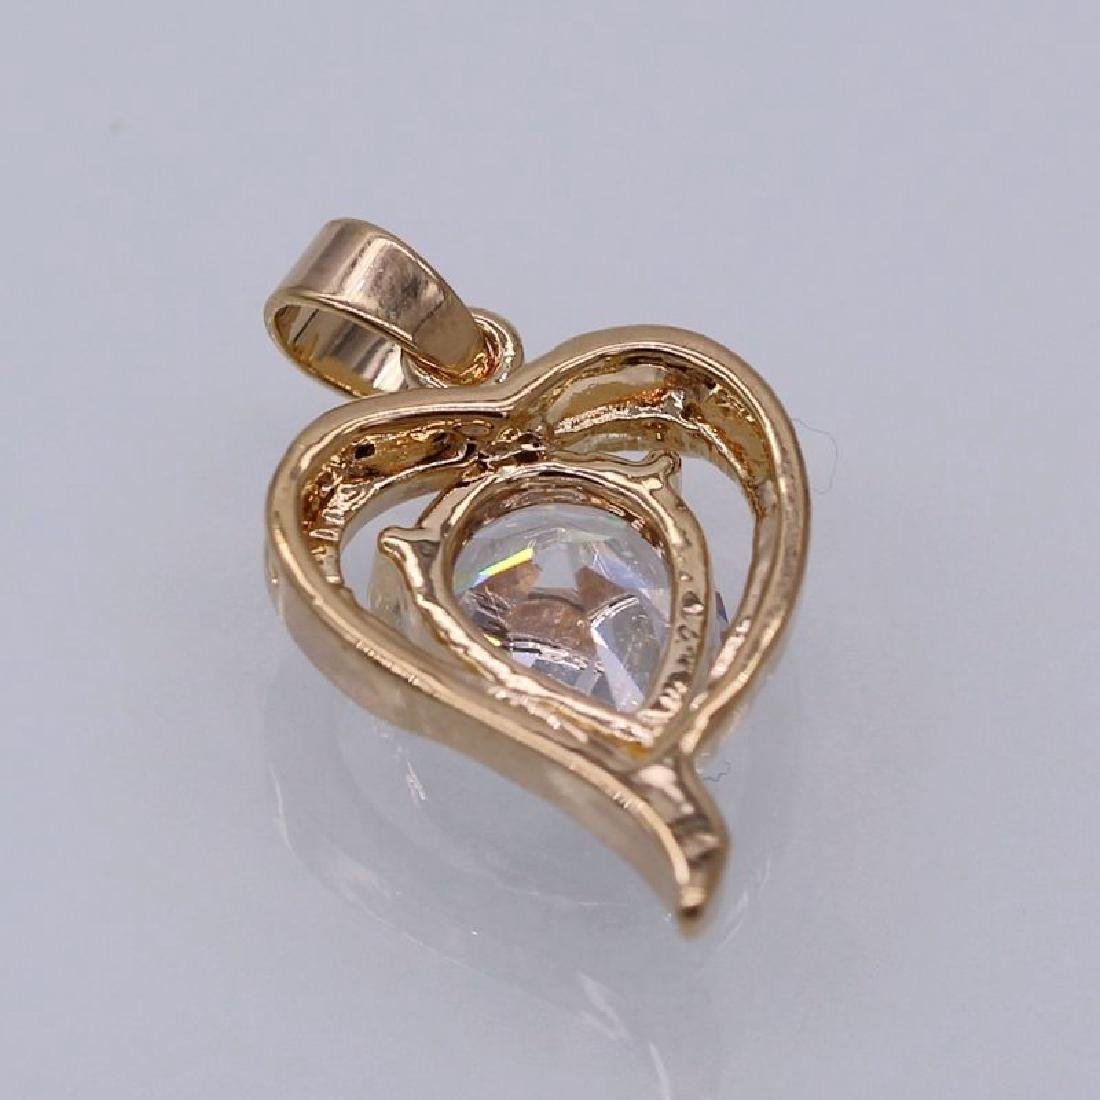 Charm Heart White Crystal 18K Yellow GP CZ Pendant - 4